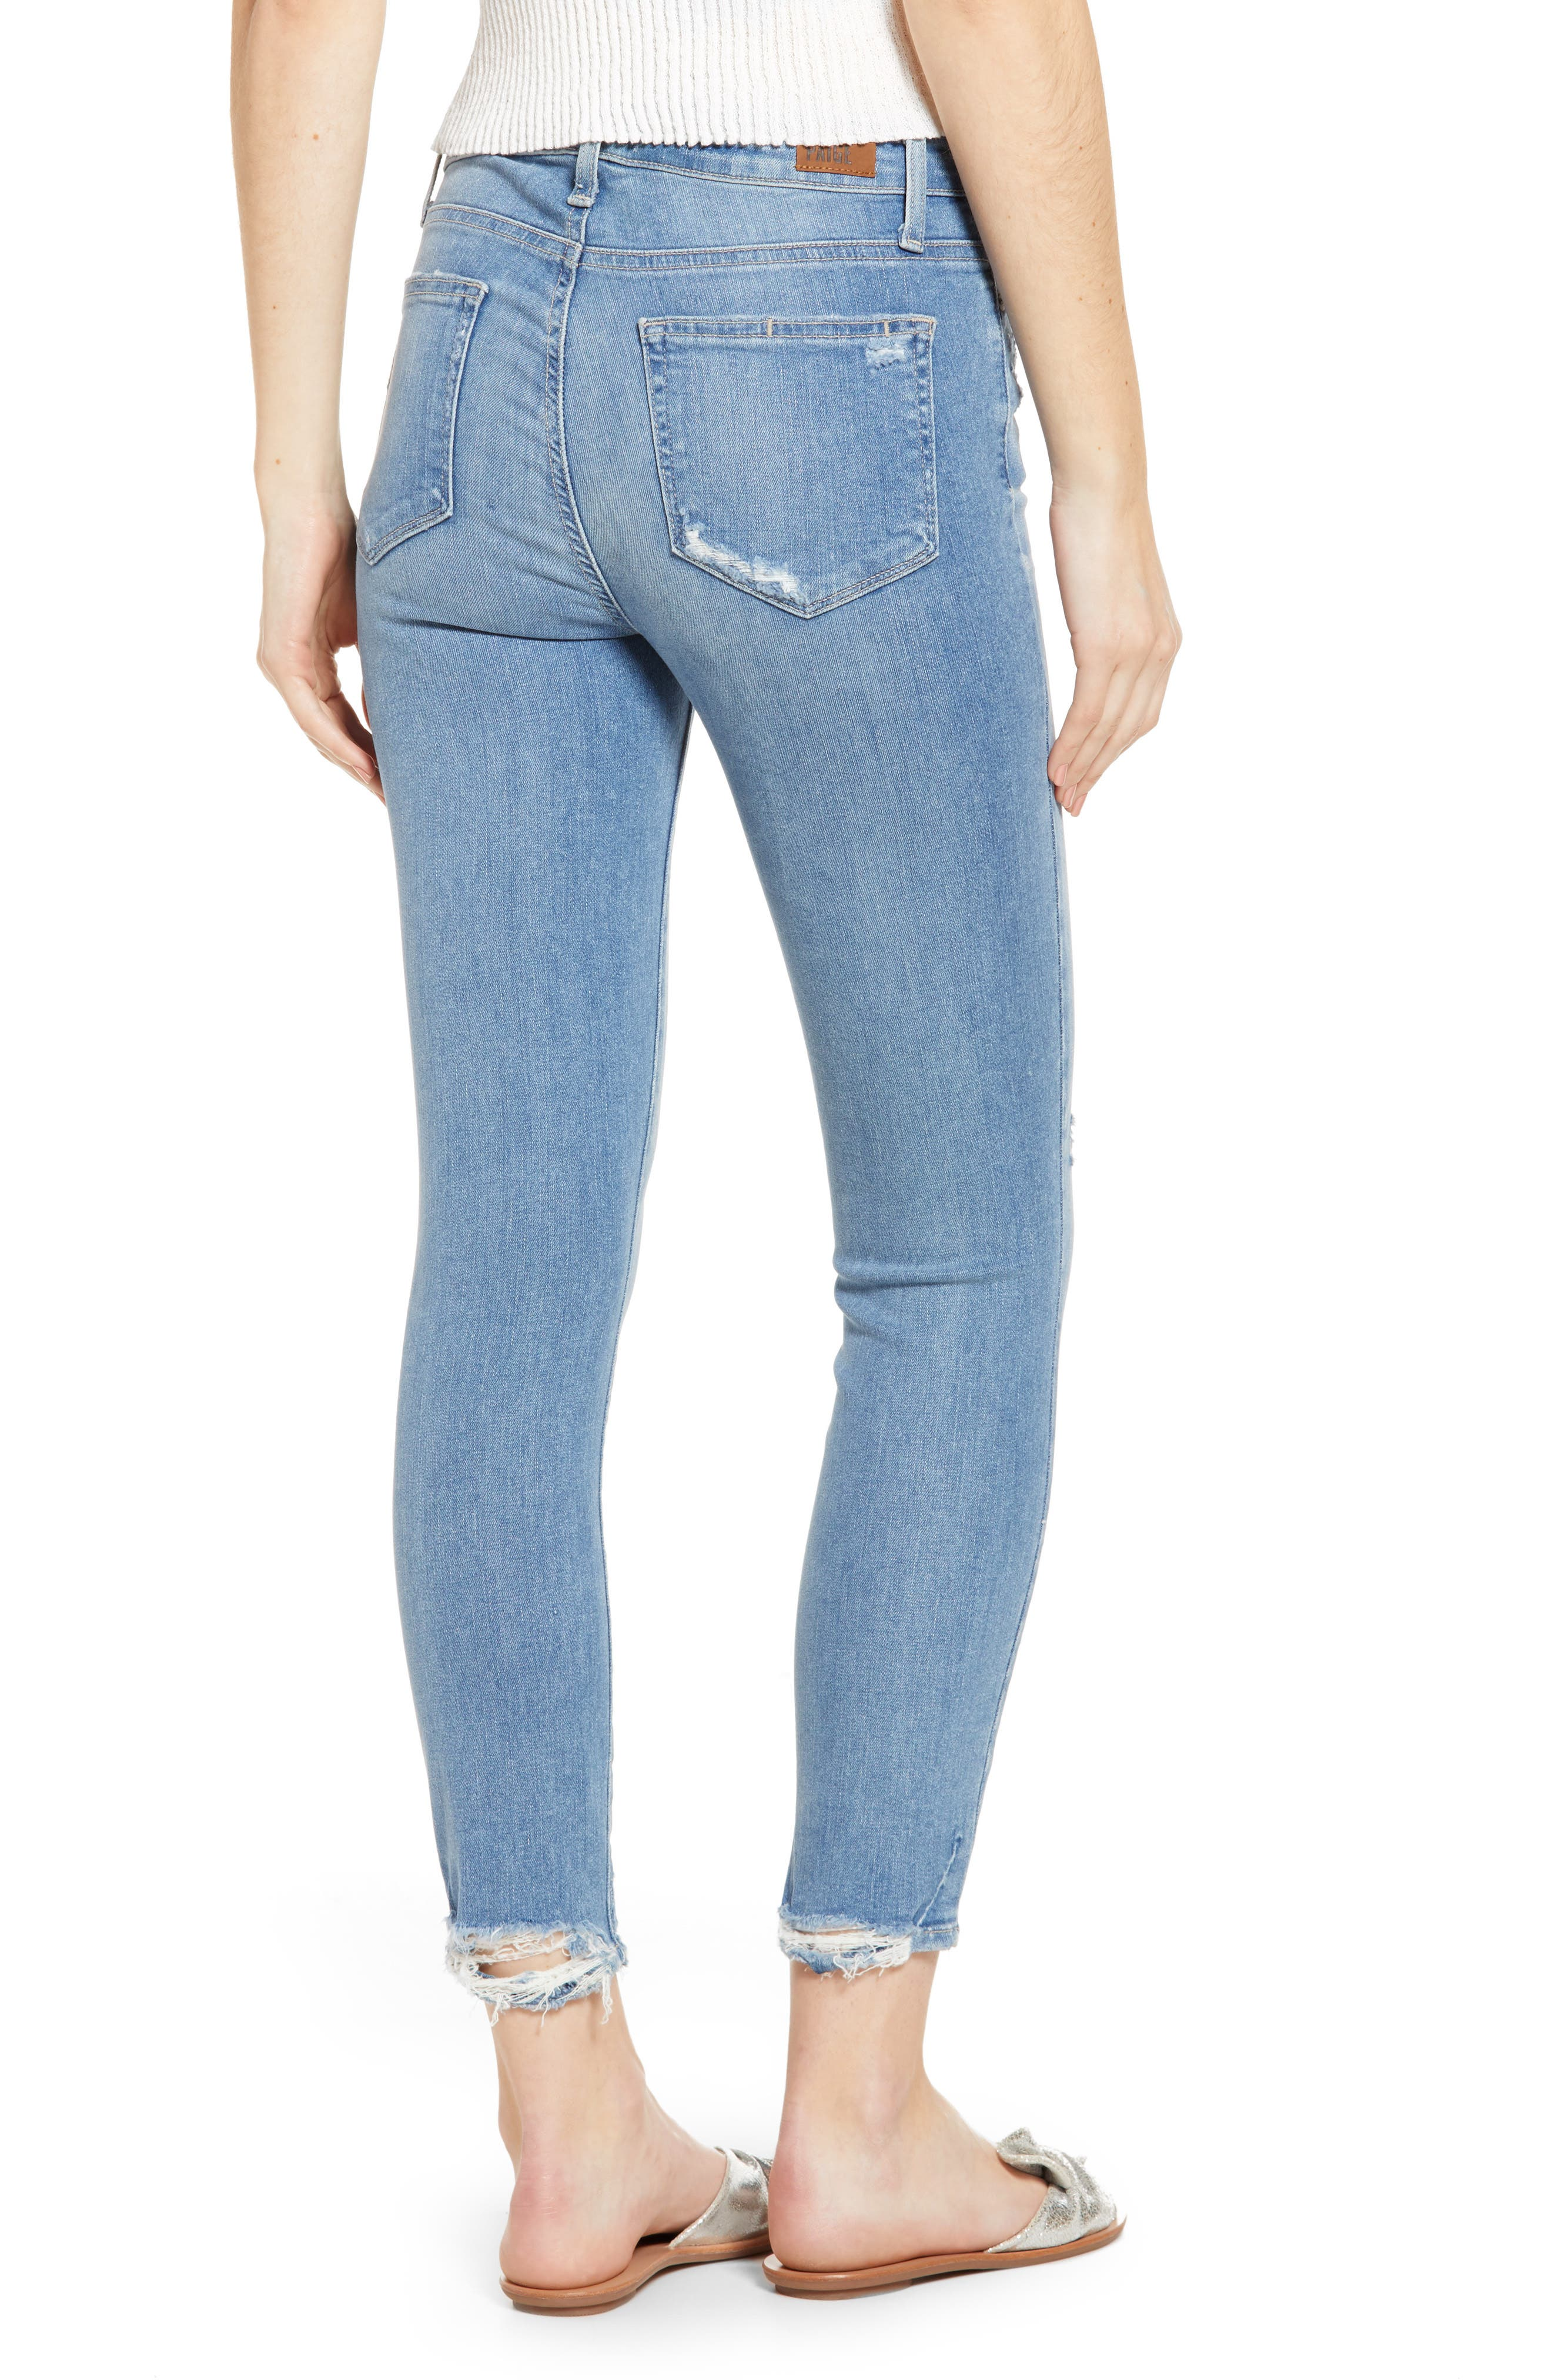 PAIGE, Hoxton Transcend Vintage High Waist Crop Skinny Jeans, Alternate thumbnail 2, color, ATTERBURY W/ TORN BACK HEM